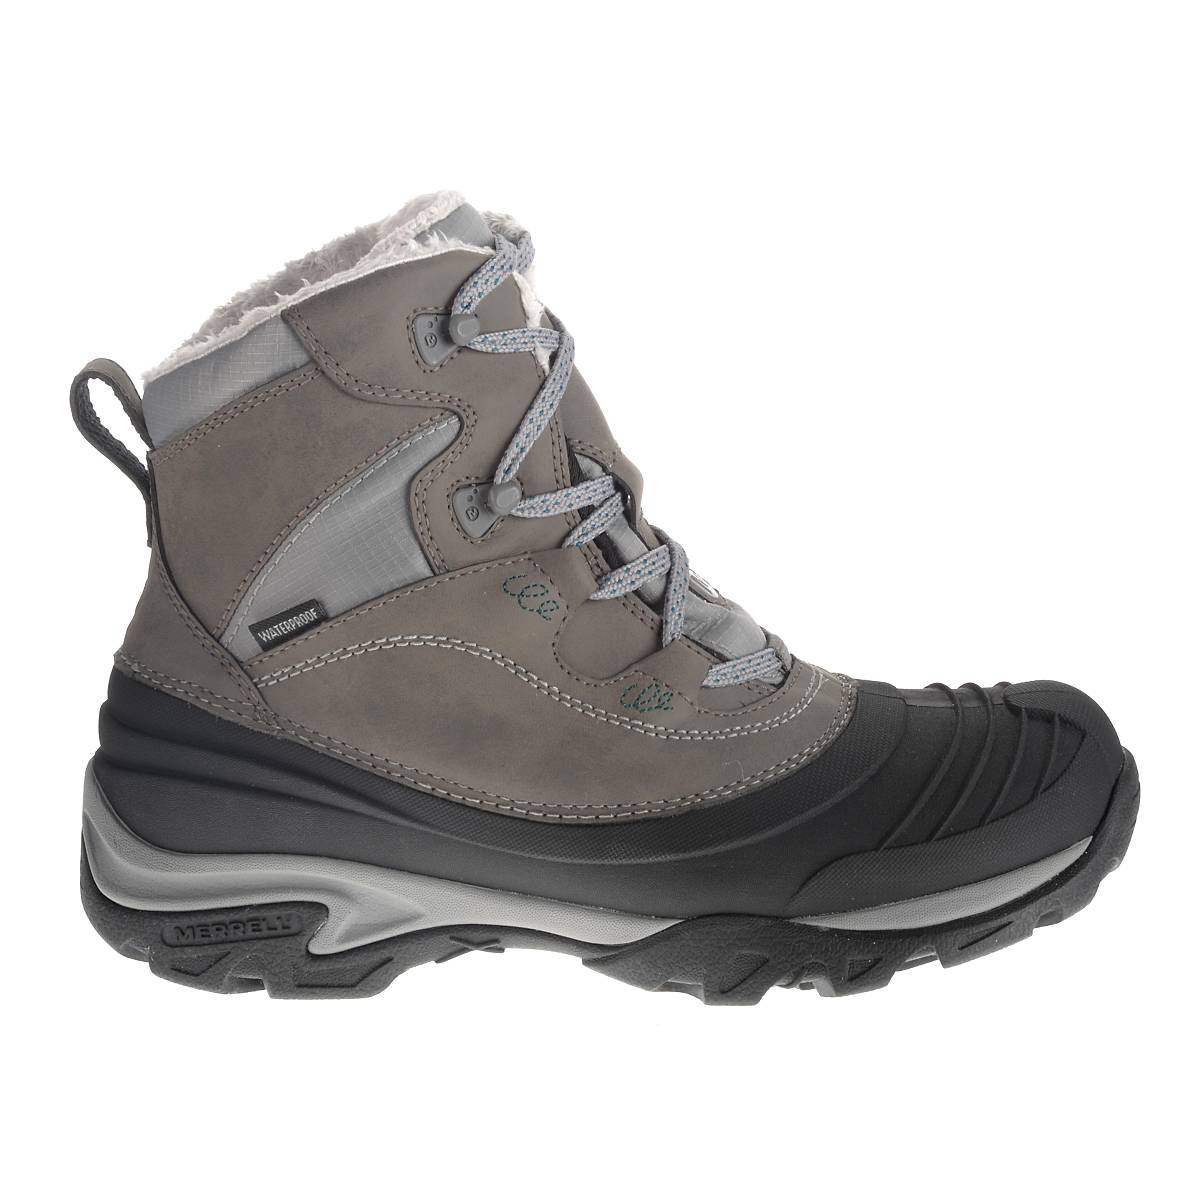 Ski Boots Sale >> Merrell Snowbound Mid Waterproof Boots - Womens